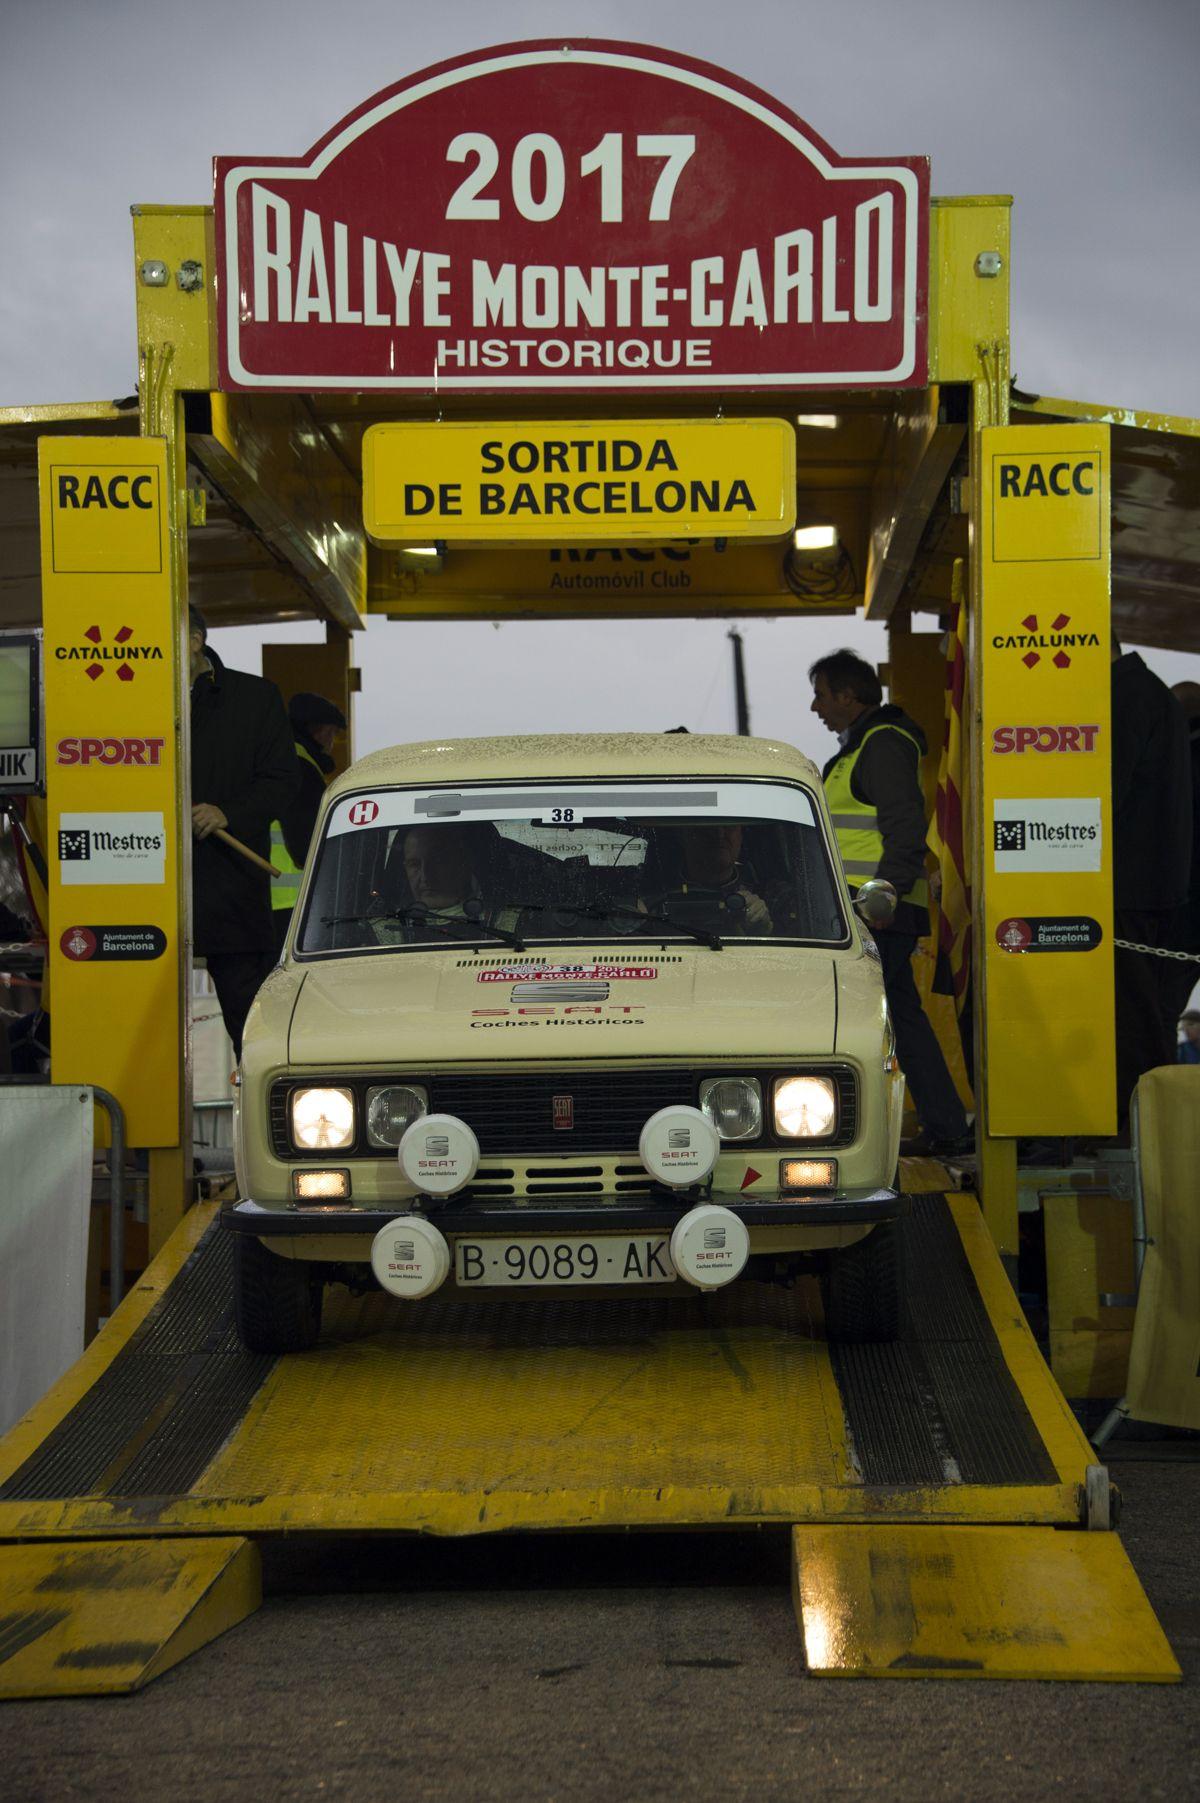 15.Podio-de-salida-en-Barcelona.-Fernando-Gmez-Blanco-Juan-Colln-SEAT-1430